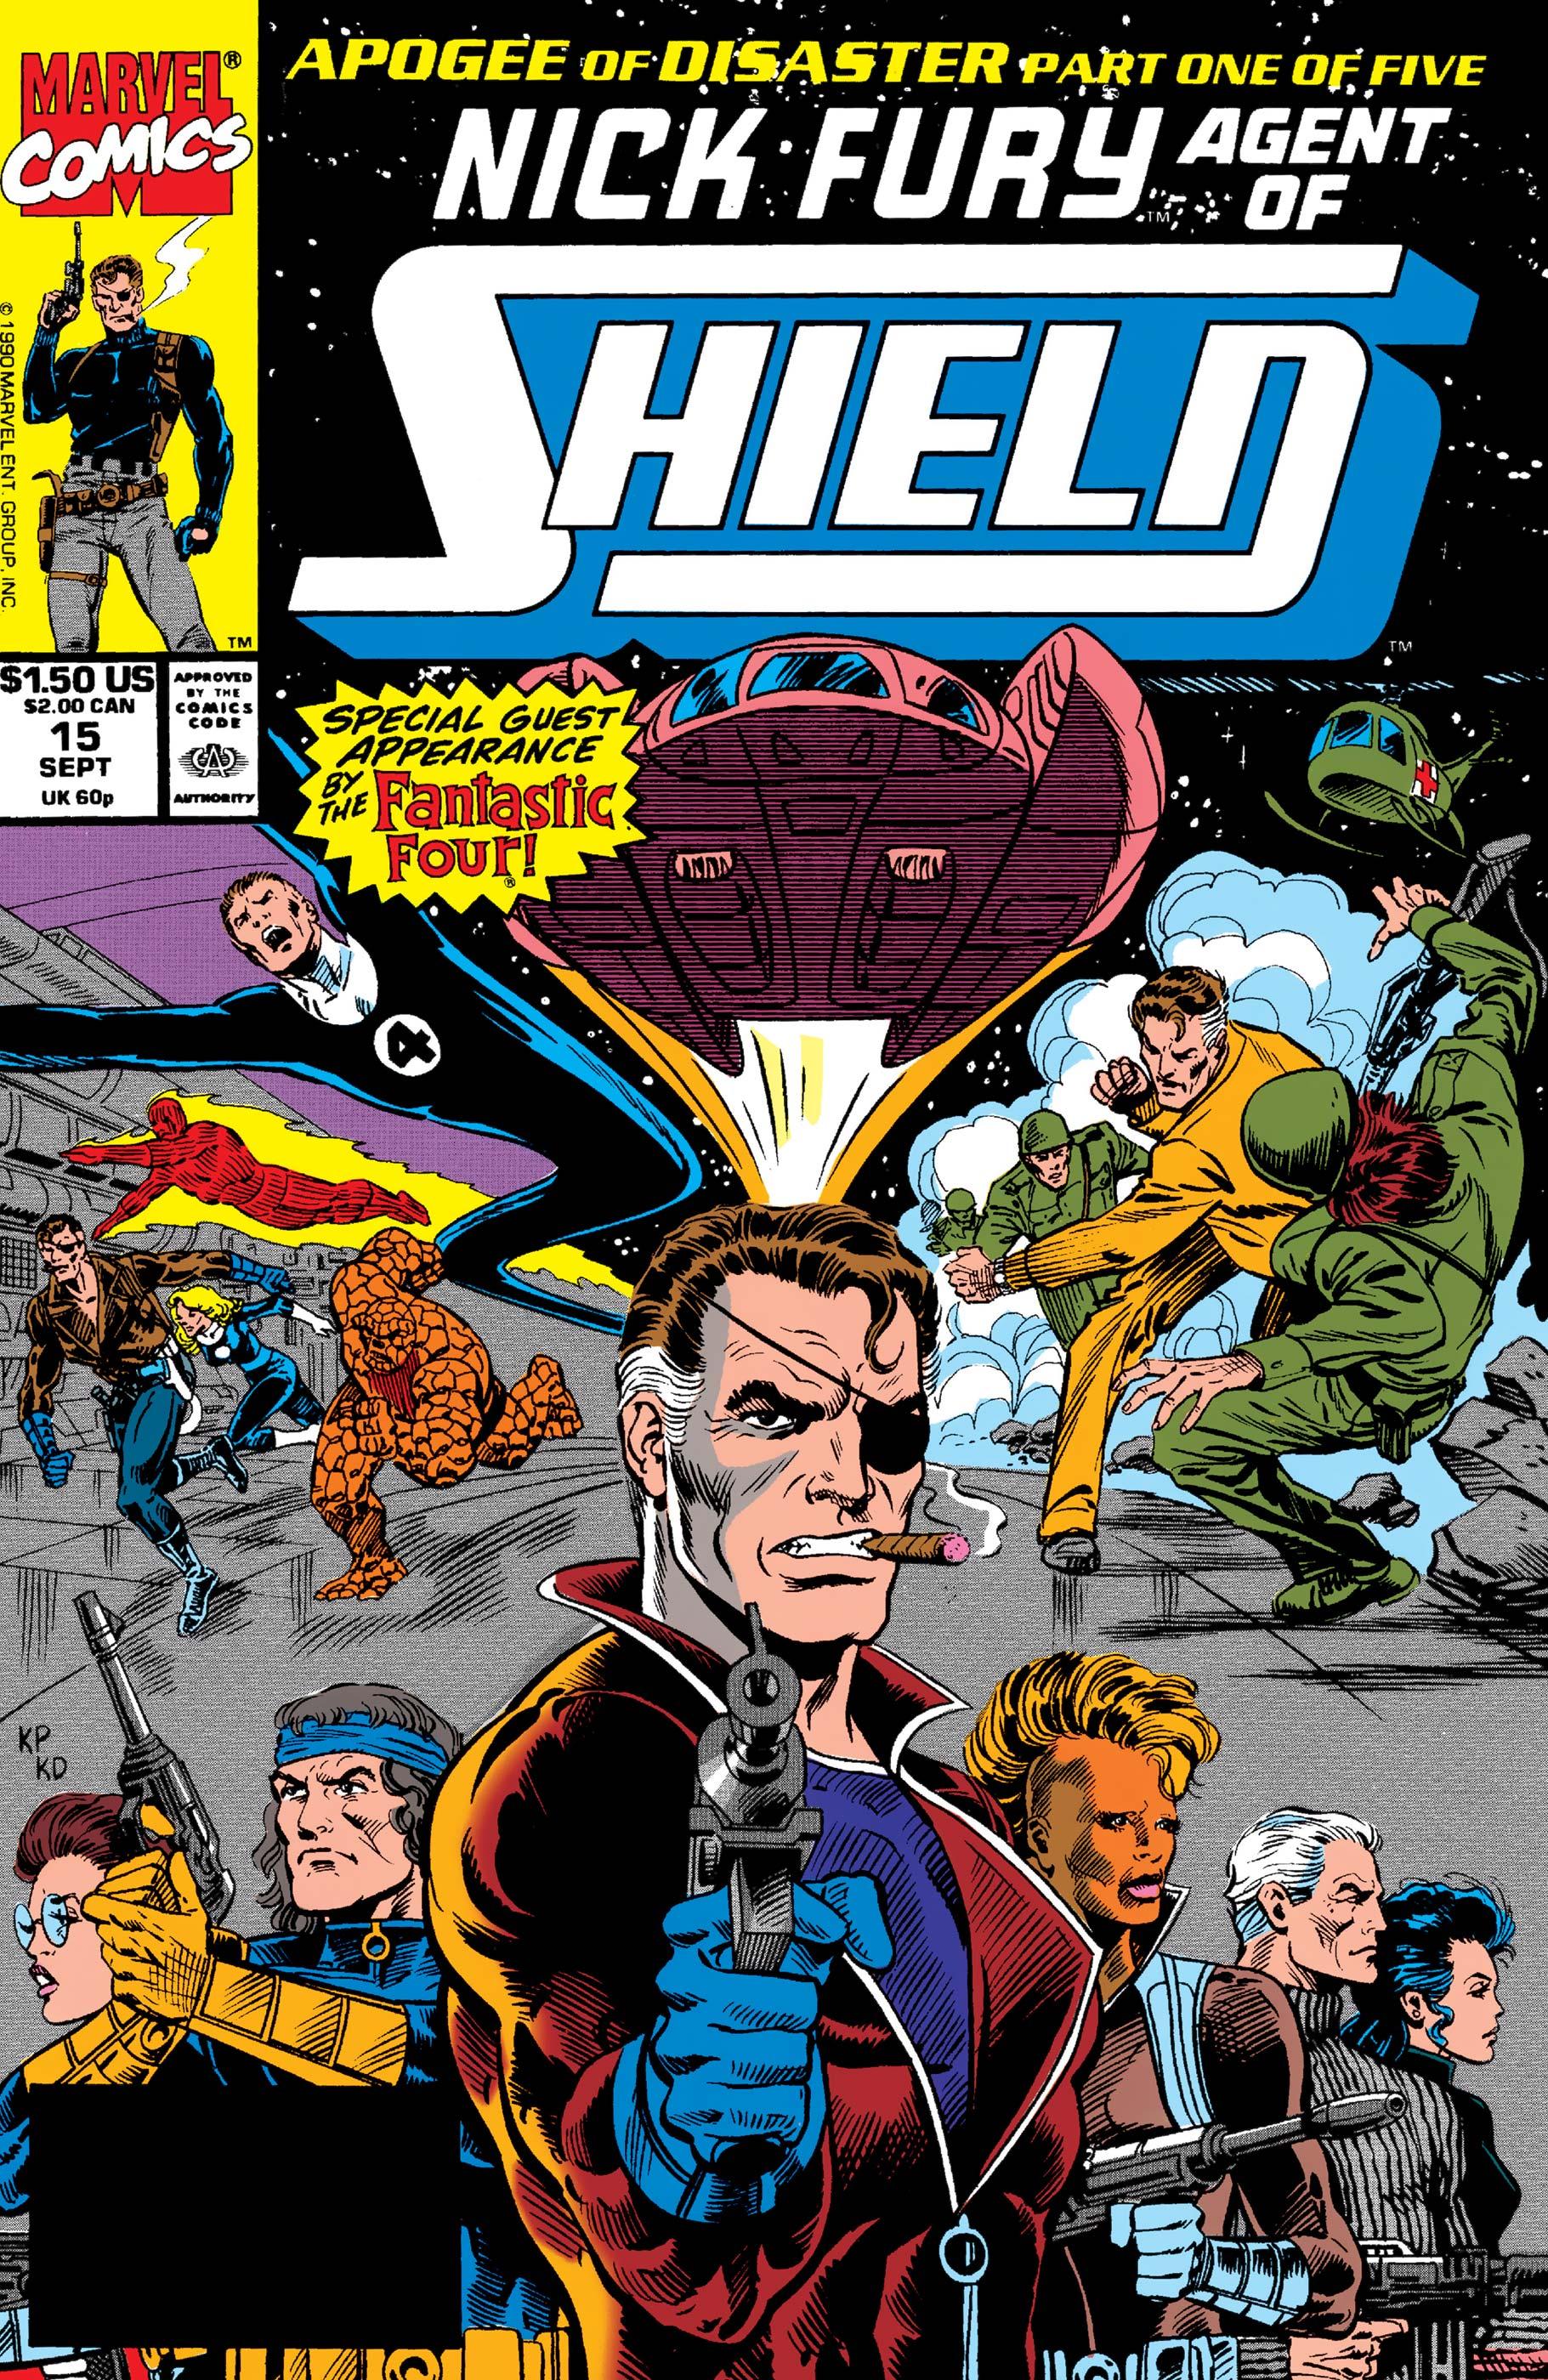 Nick Fury, Agent of S.H.I.E.L.D. (1989) #15